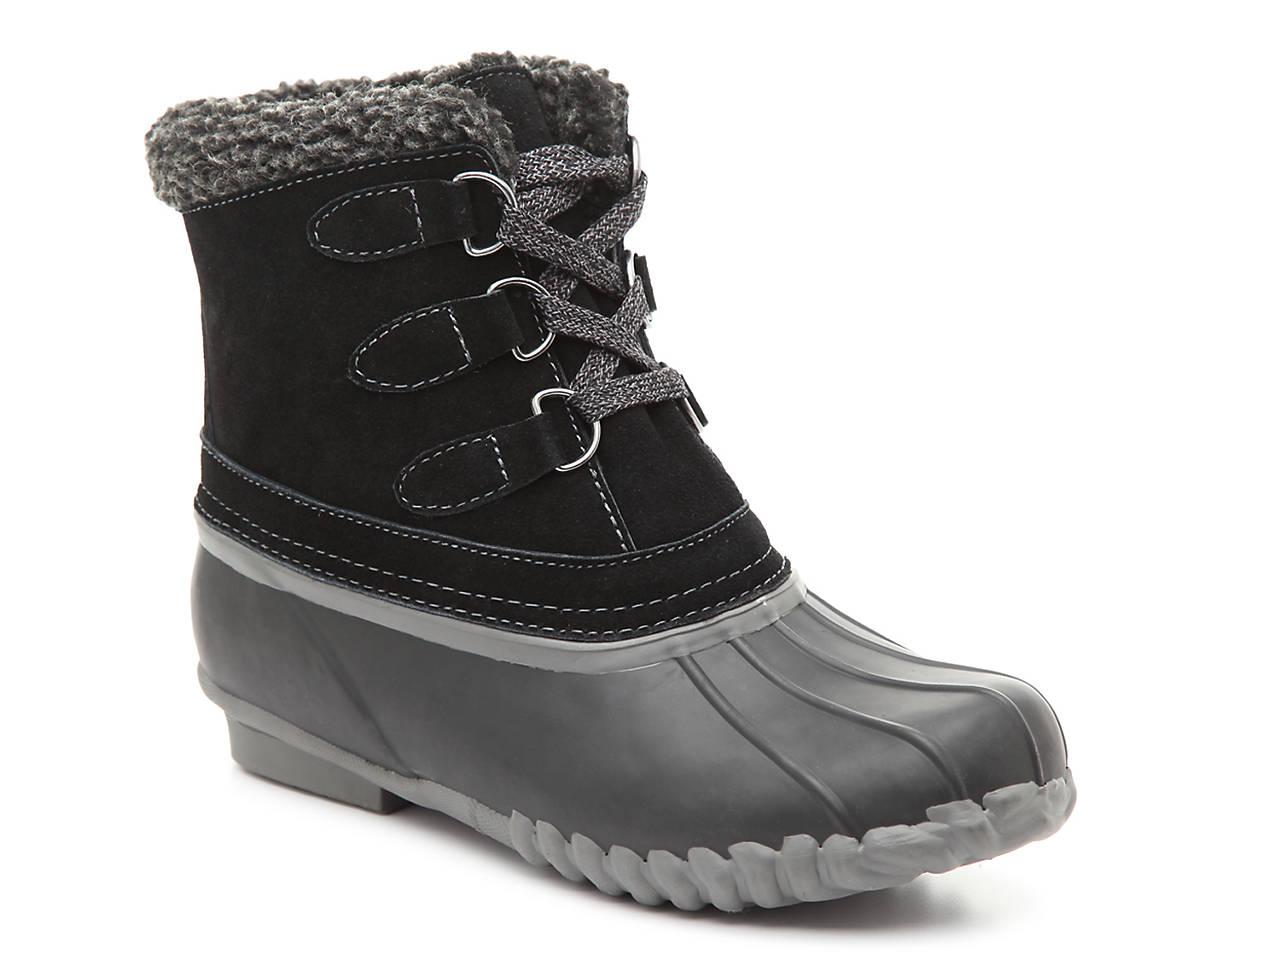 ca9c1016bed2 Sporto Degas 3 Duck Boot Women s Shoes